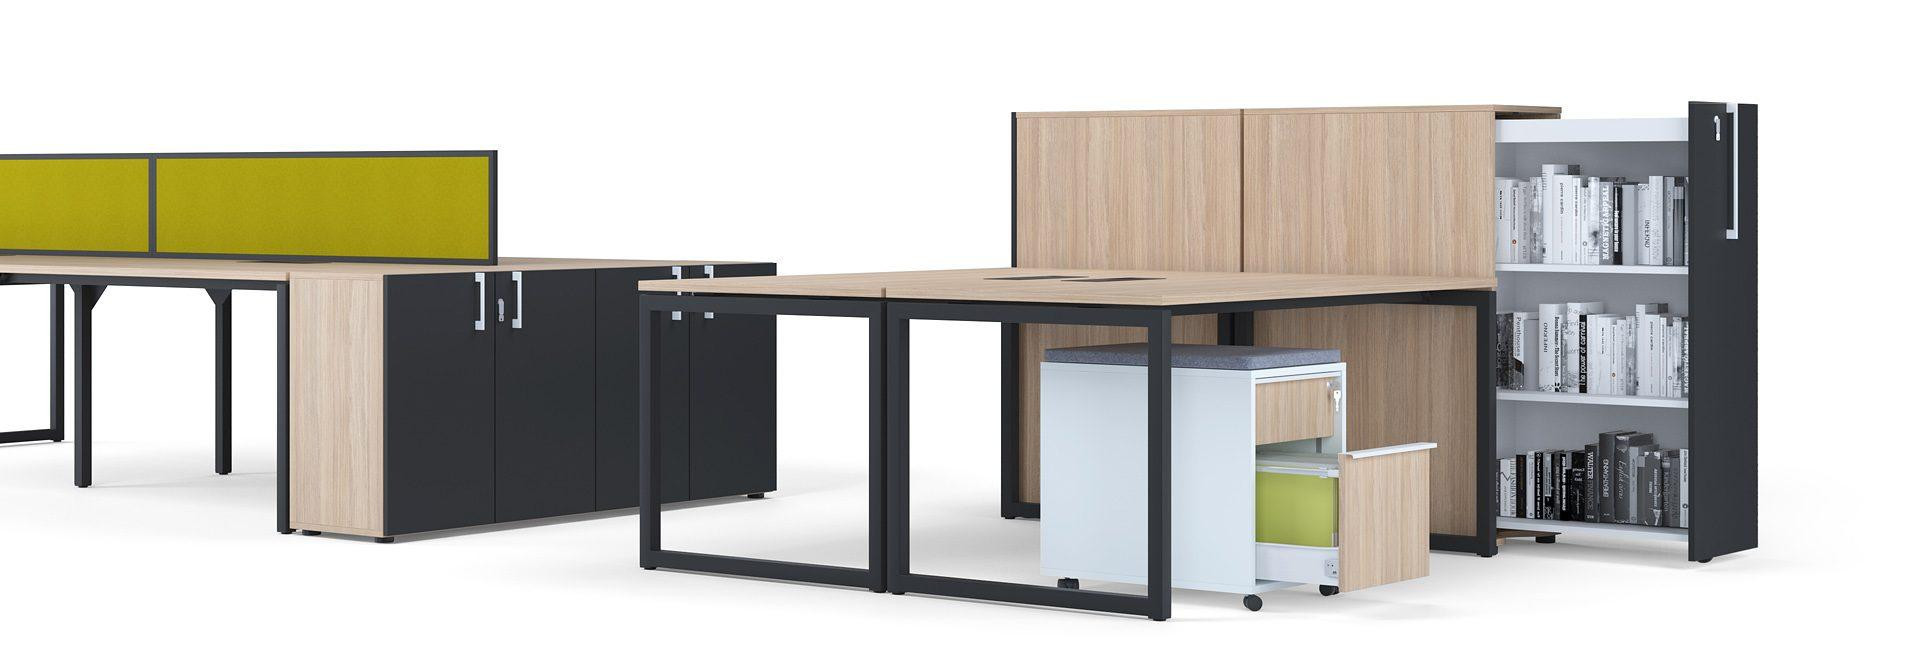 Single-desks-broad-ranging-system-NOVA-O